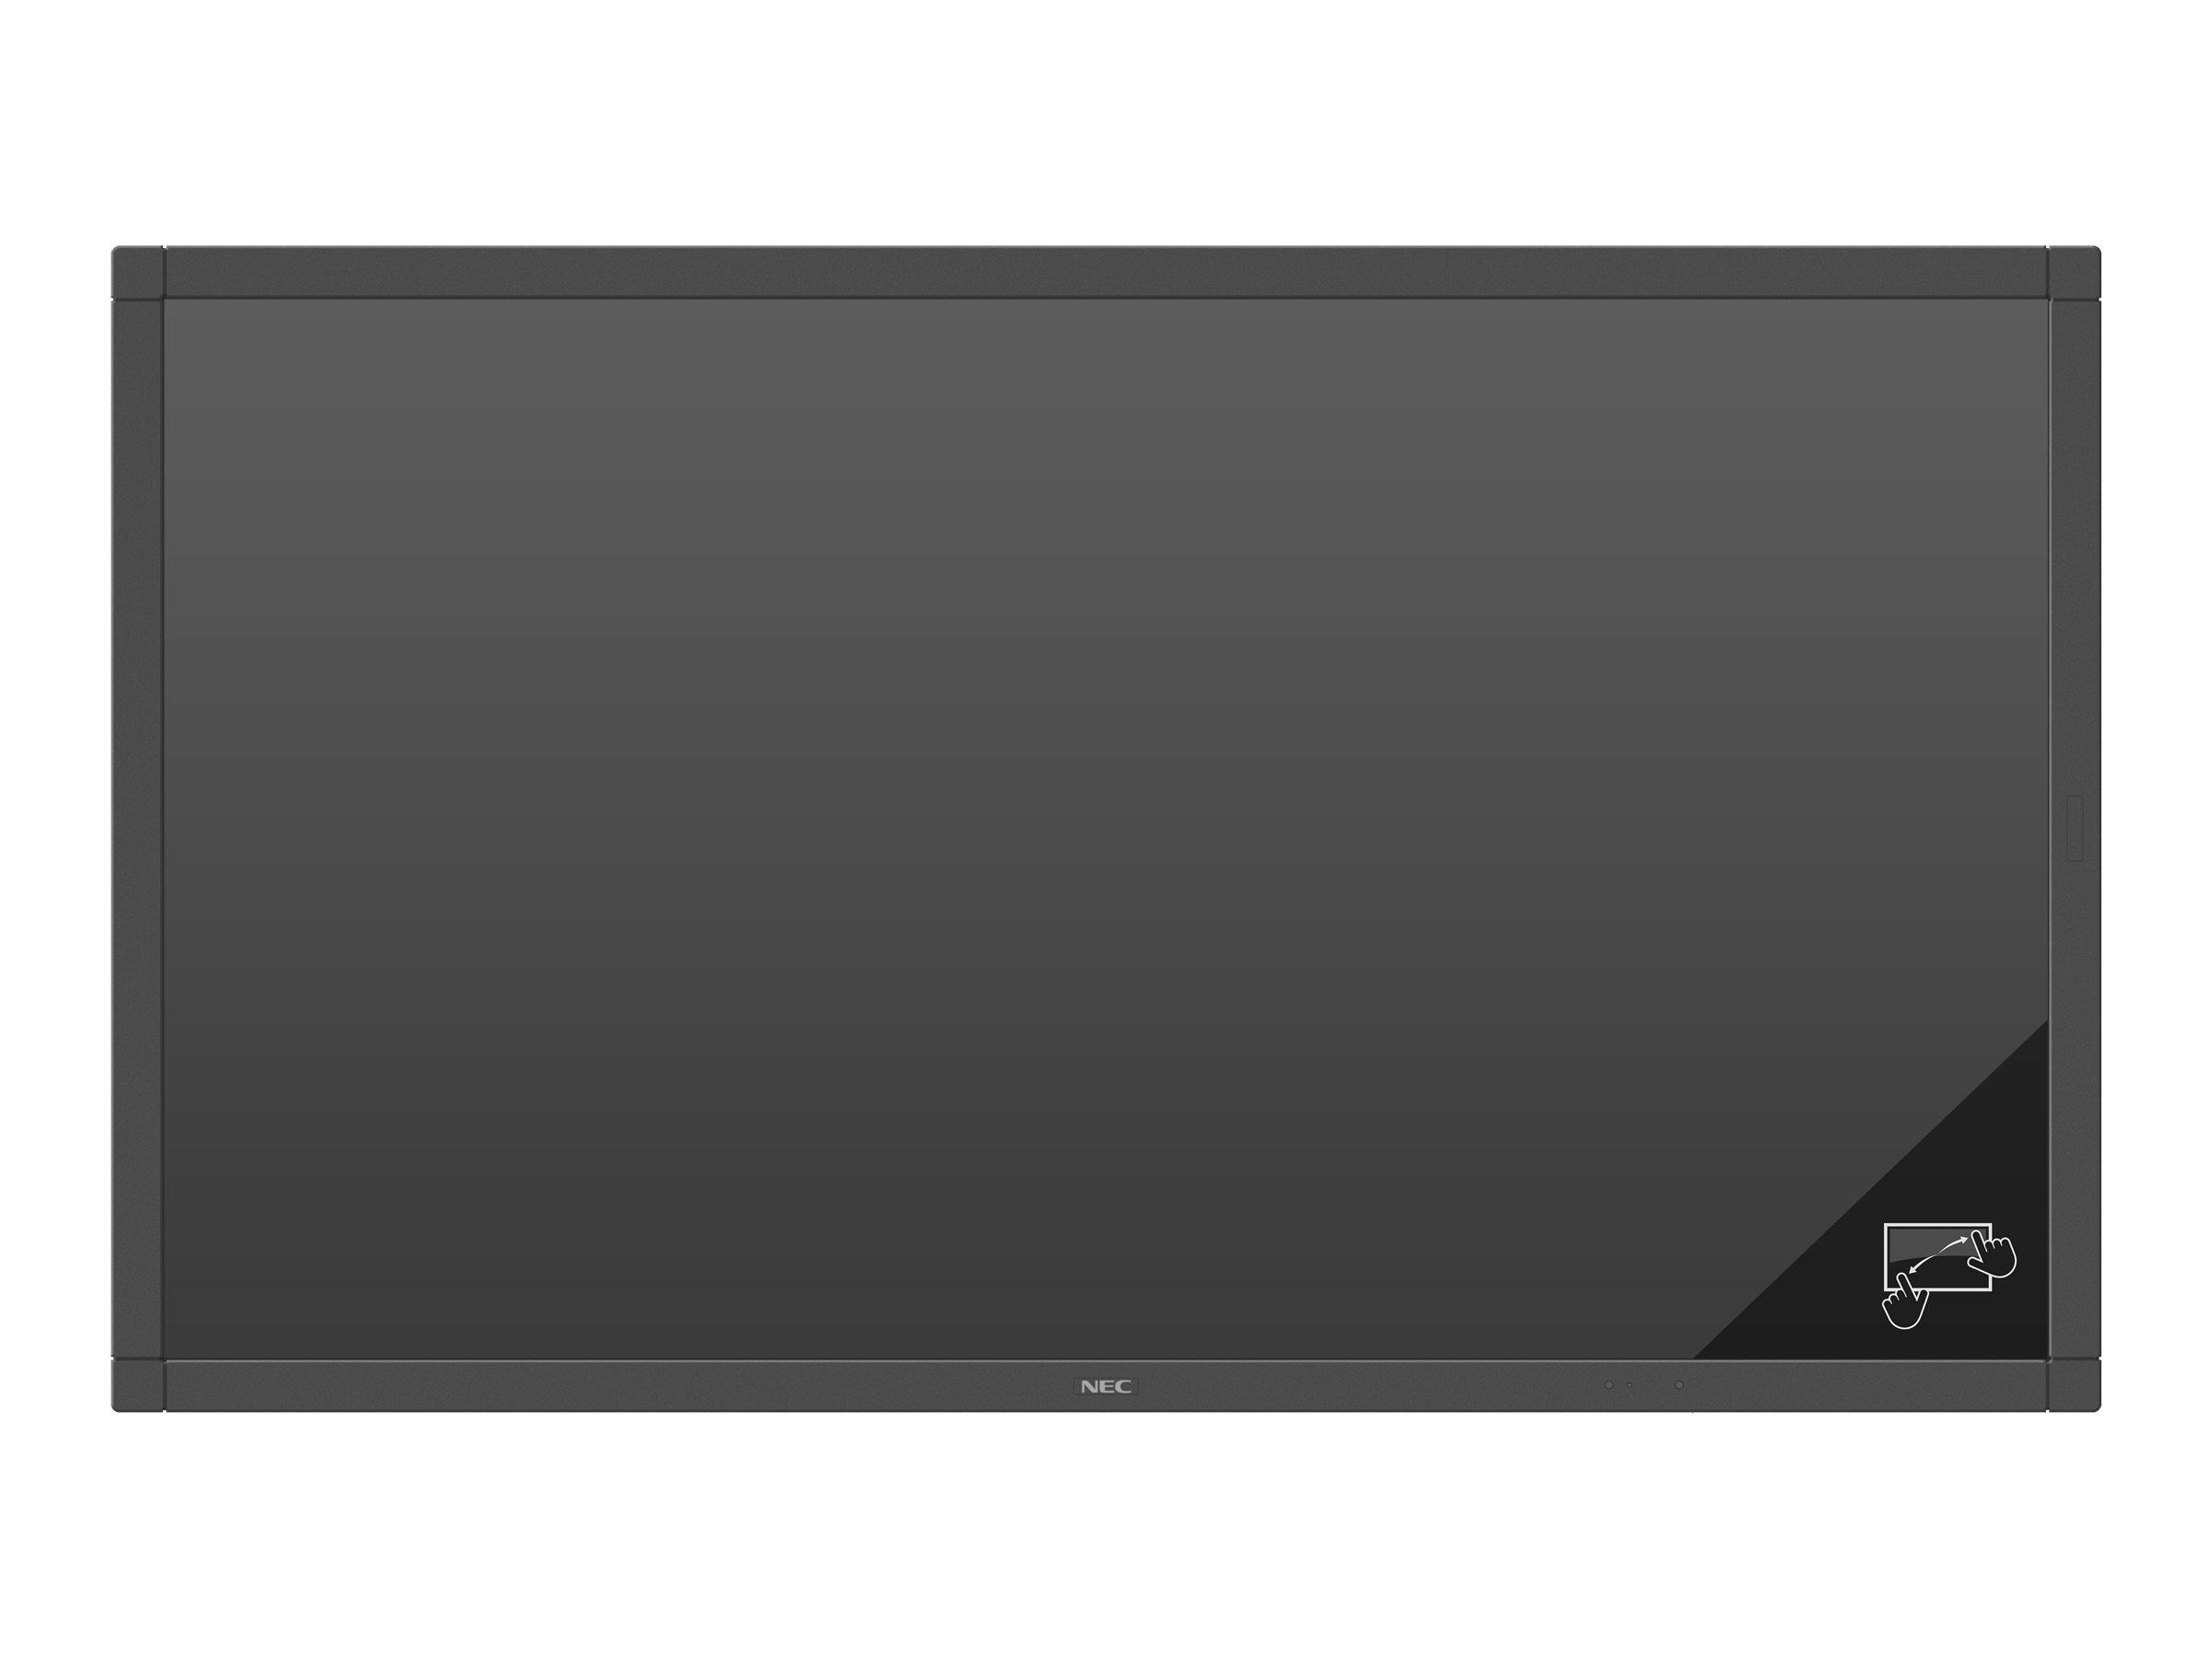 NEC MultiSync V484-T - 121.9 cm (48